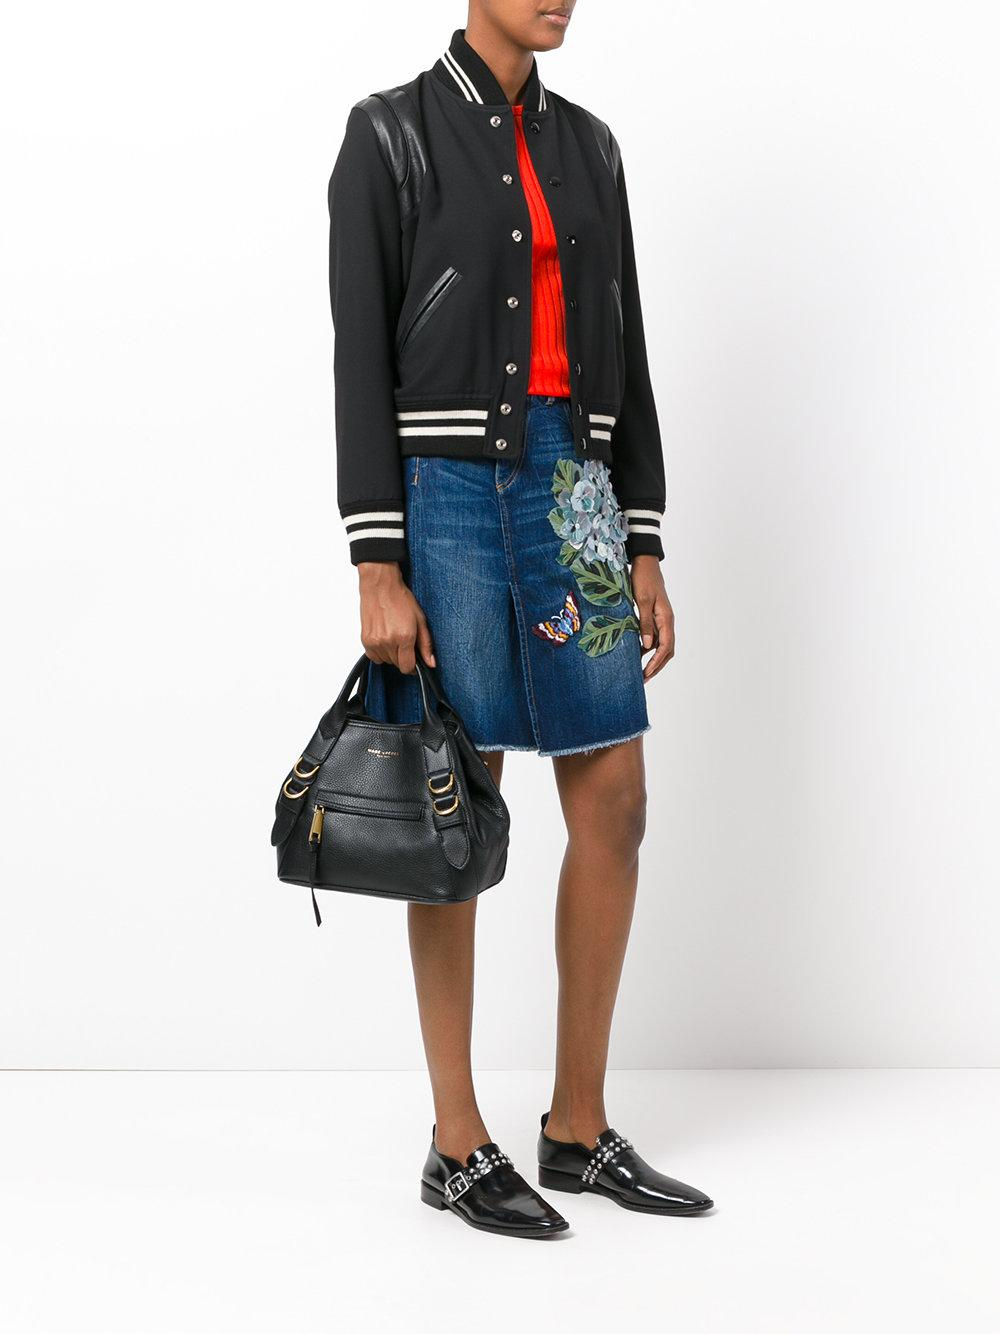 'the Small Anchor' Bag